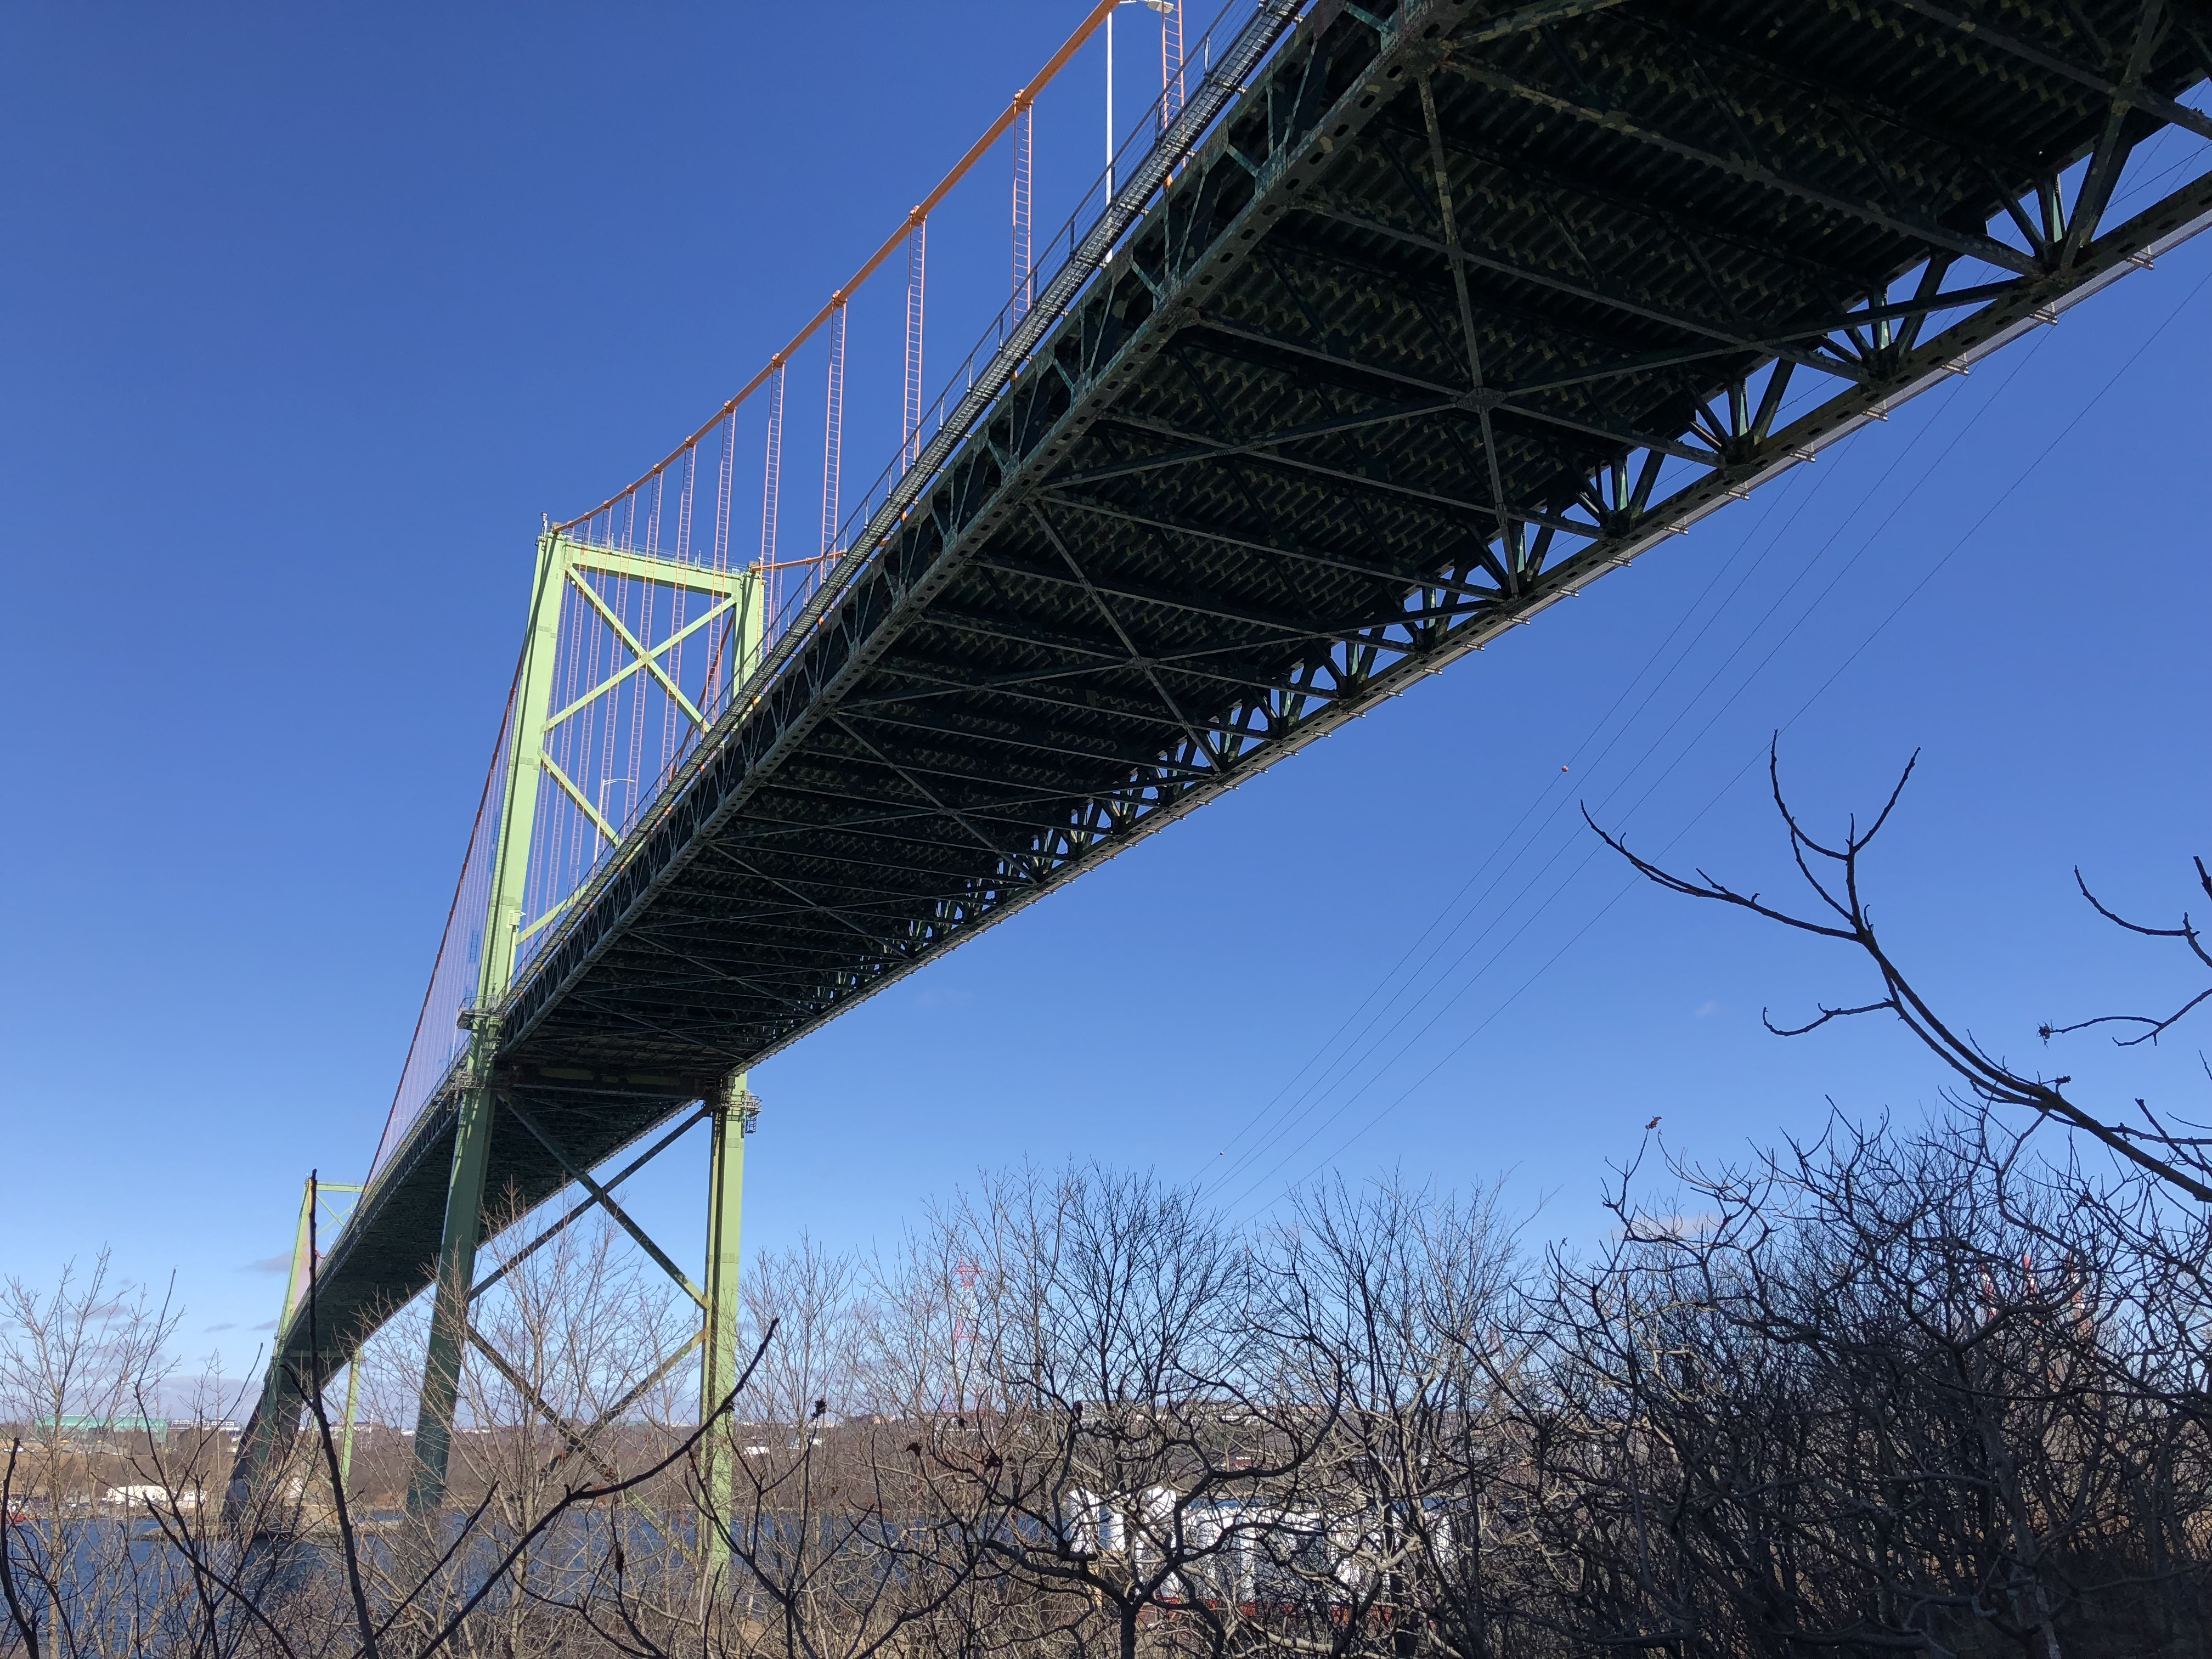 MacKay Bridge to be closed Sunday afternoon